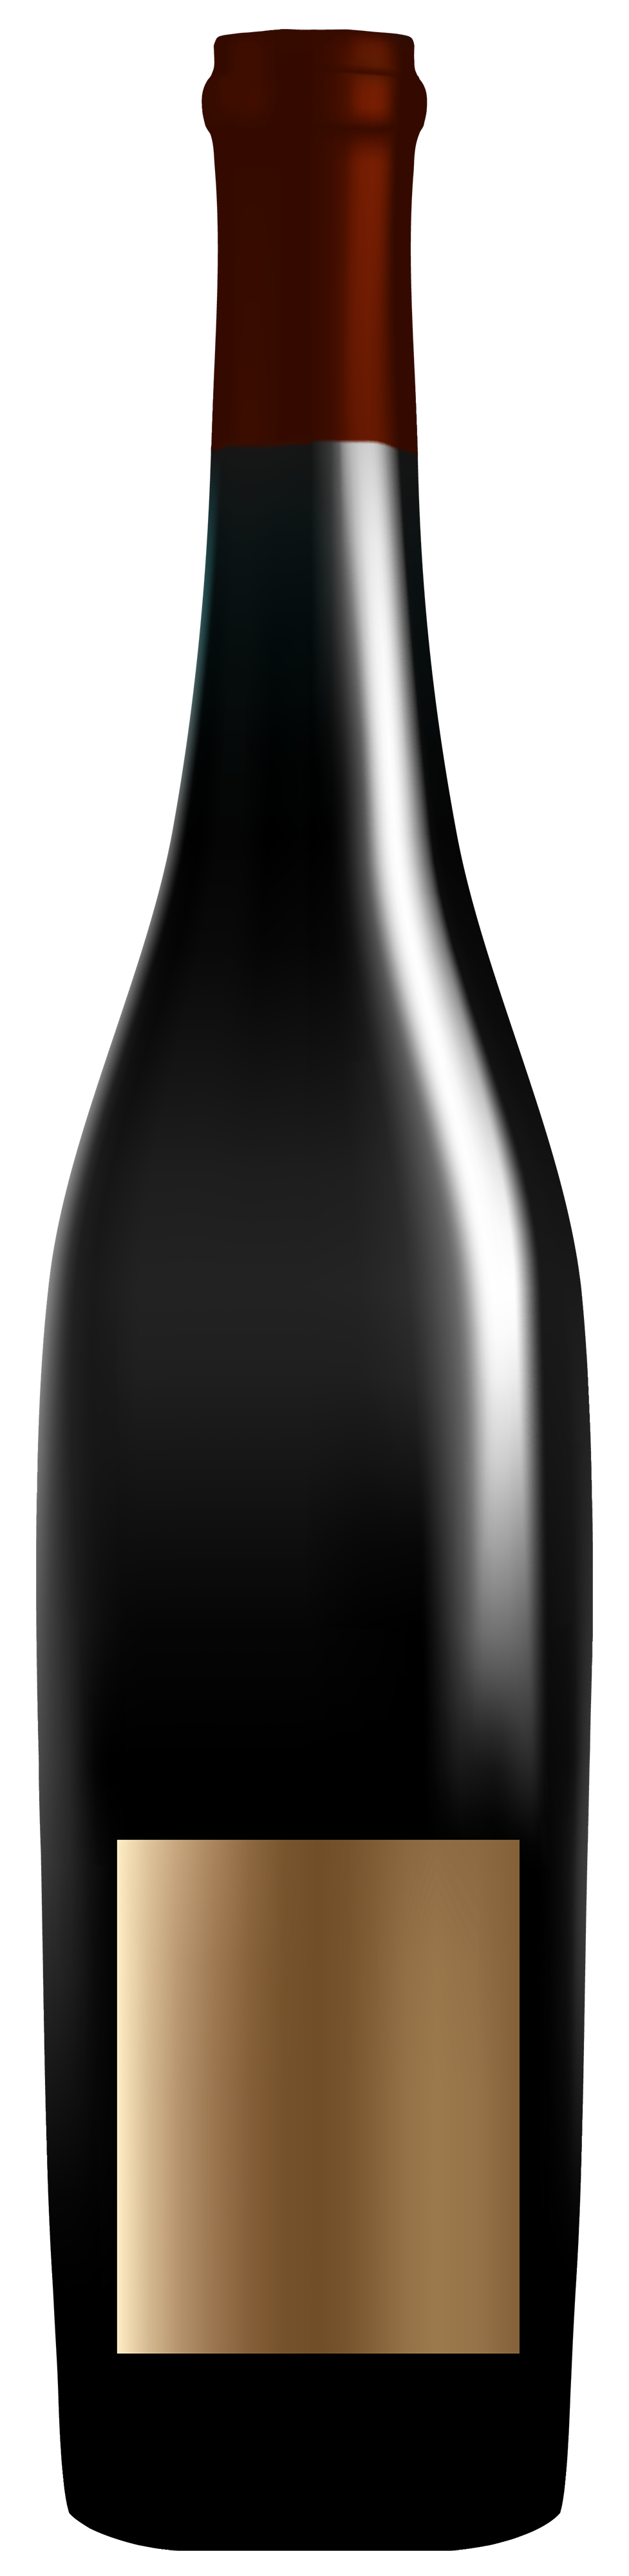 Elegant clipart best web. Wine bottle silhouette png